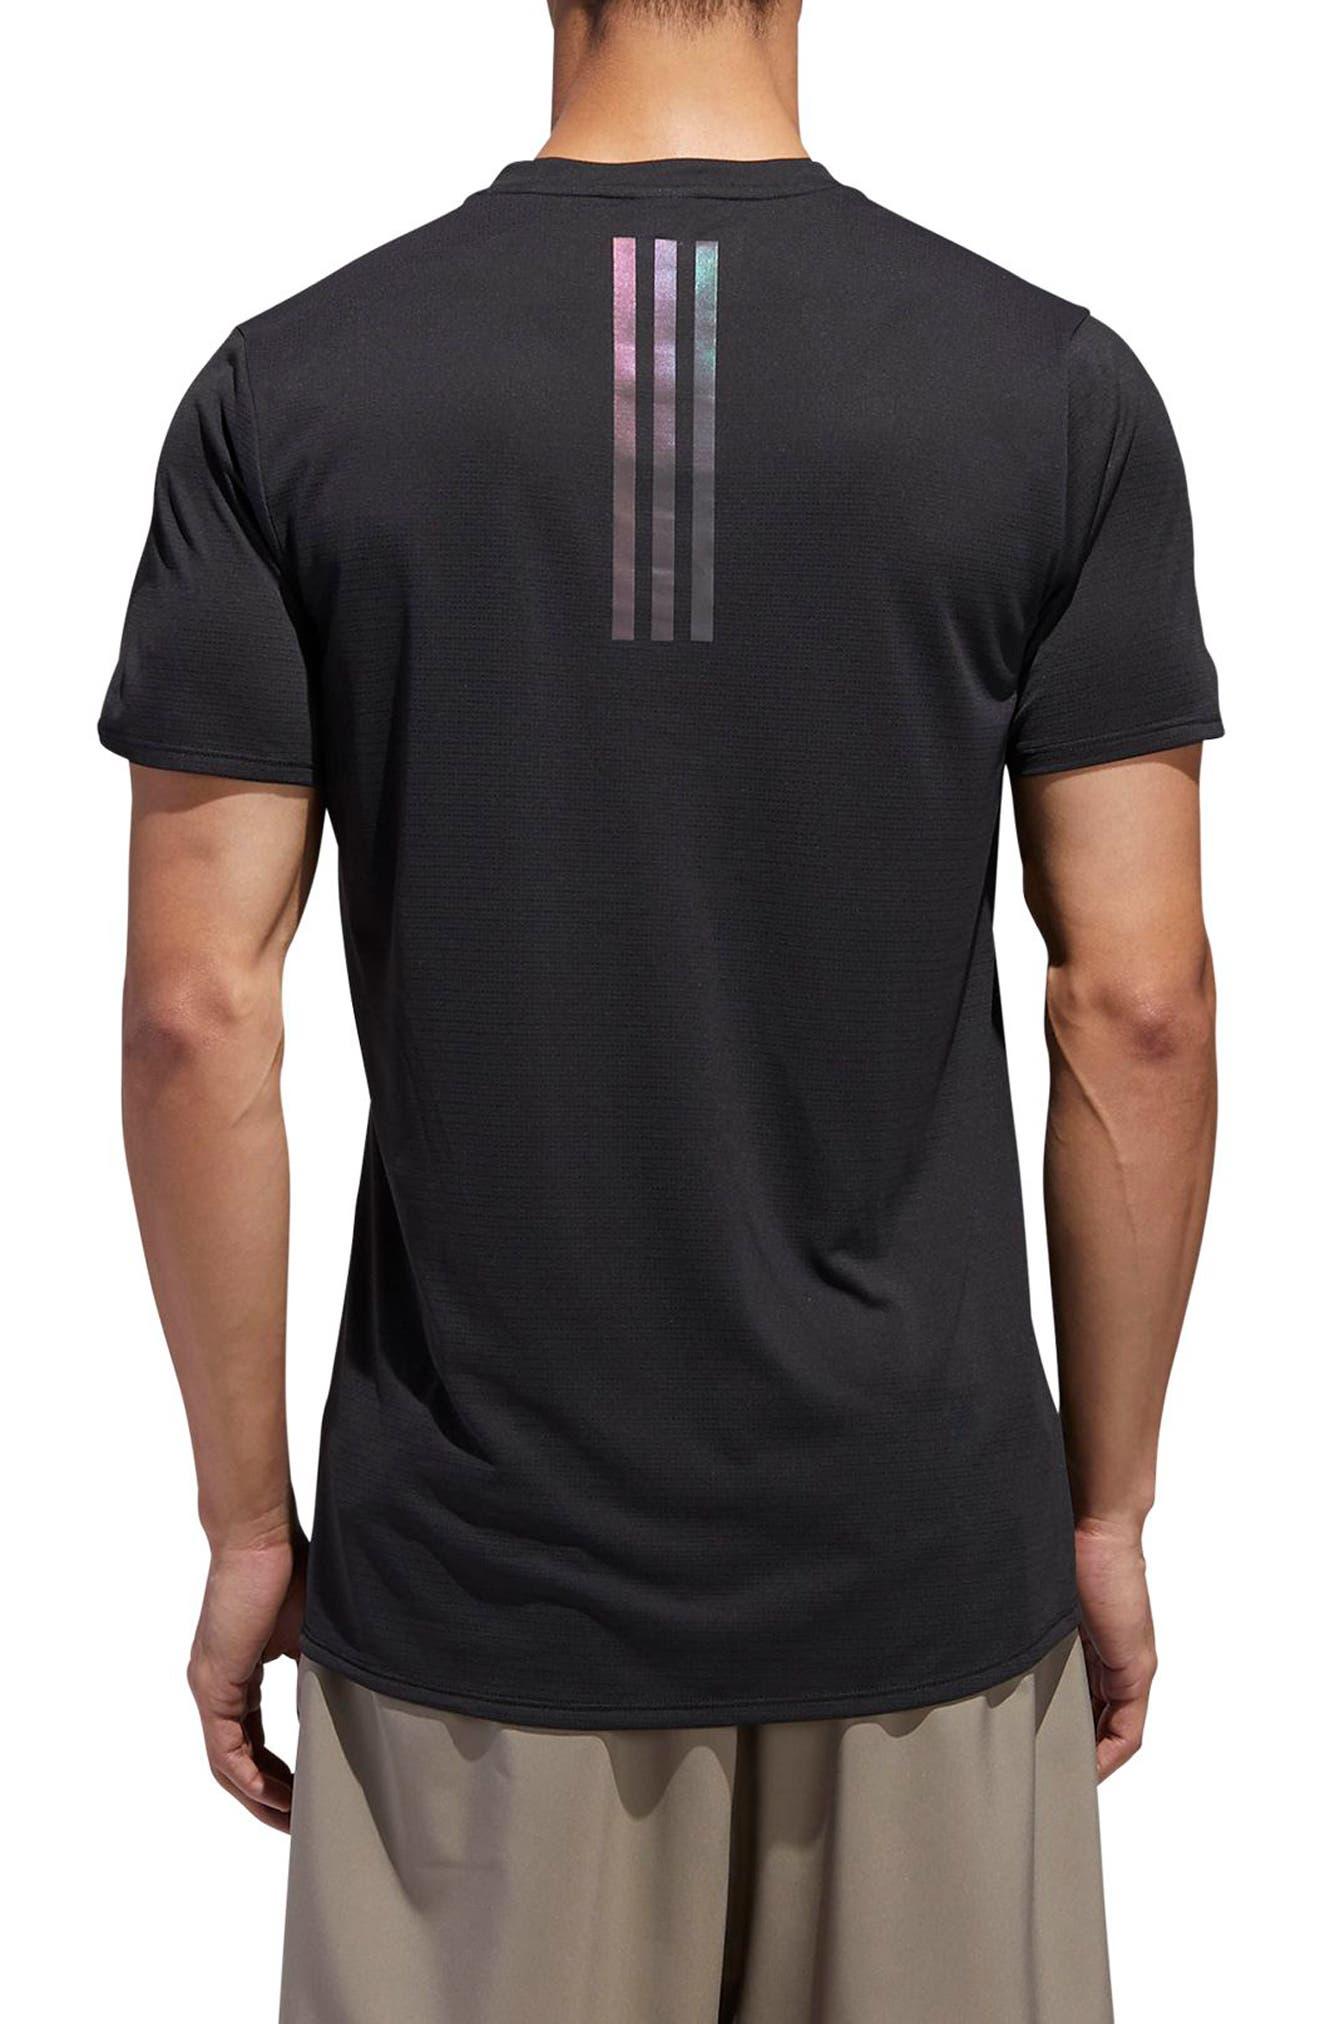 Supernova Regular Fit Short Sleeve Reflective Running T-Shirt,                             Alternate thumbnail 2, color,                             BLACK